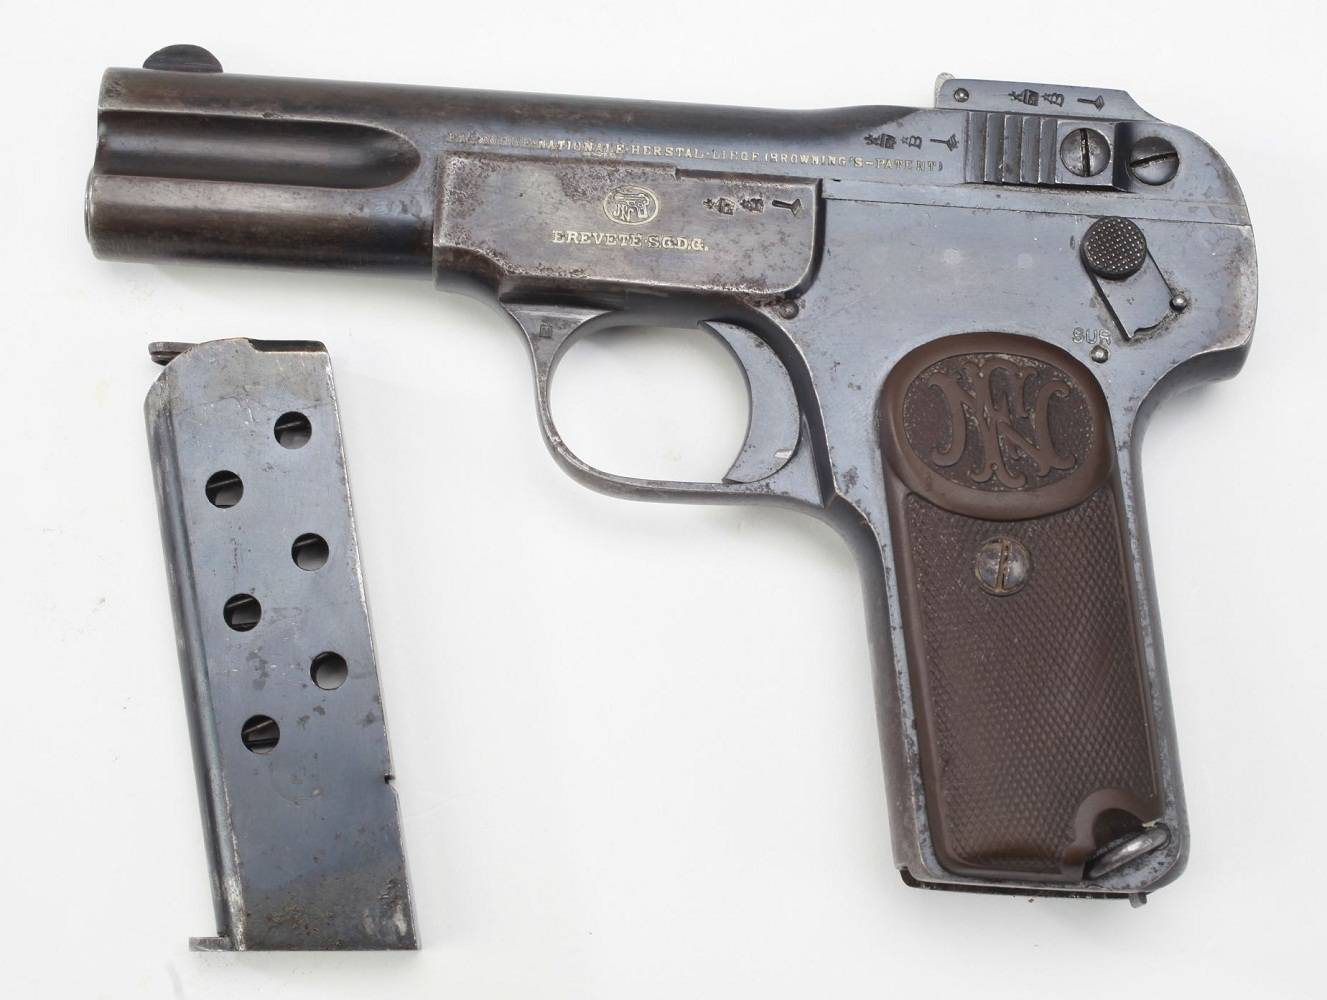 Browning m1903 — википедия переиздание // wiki 2